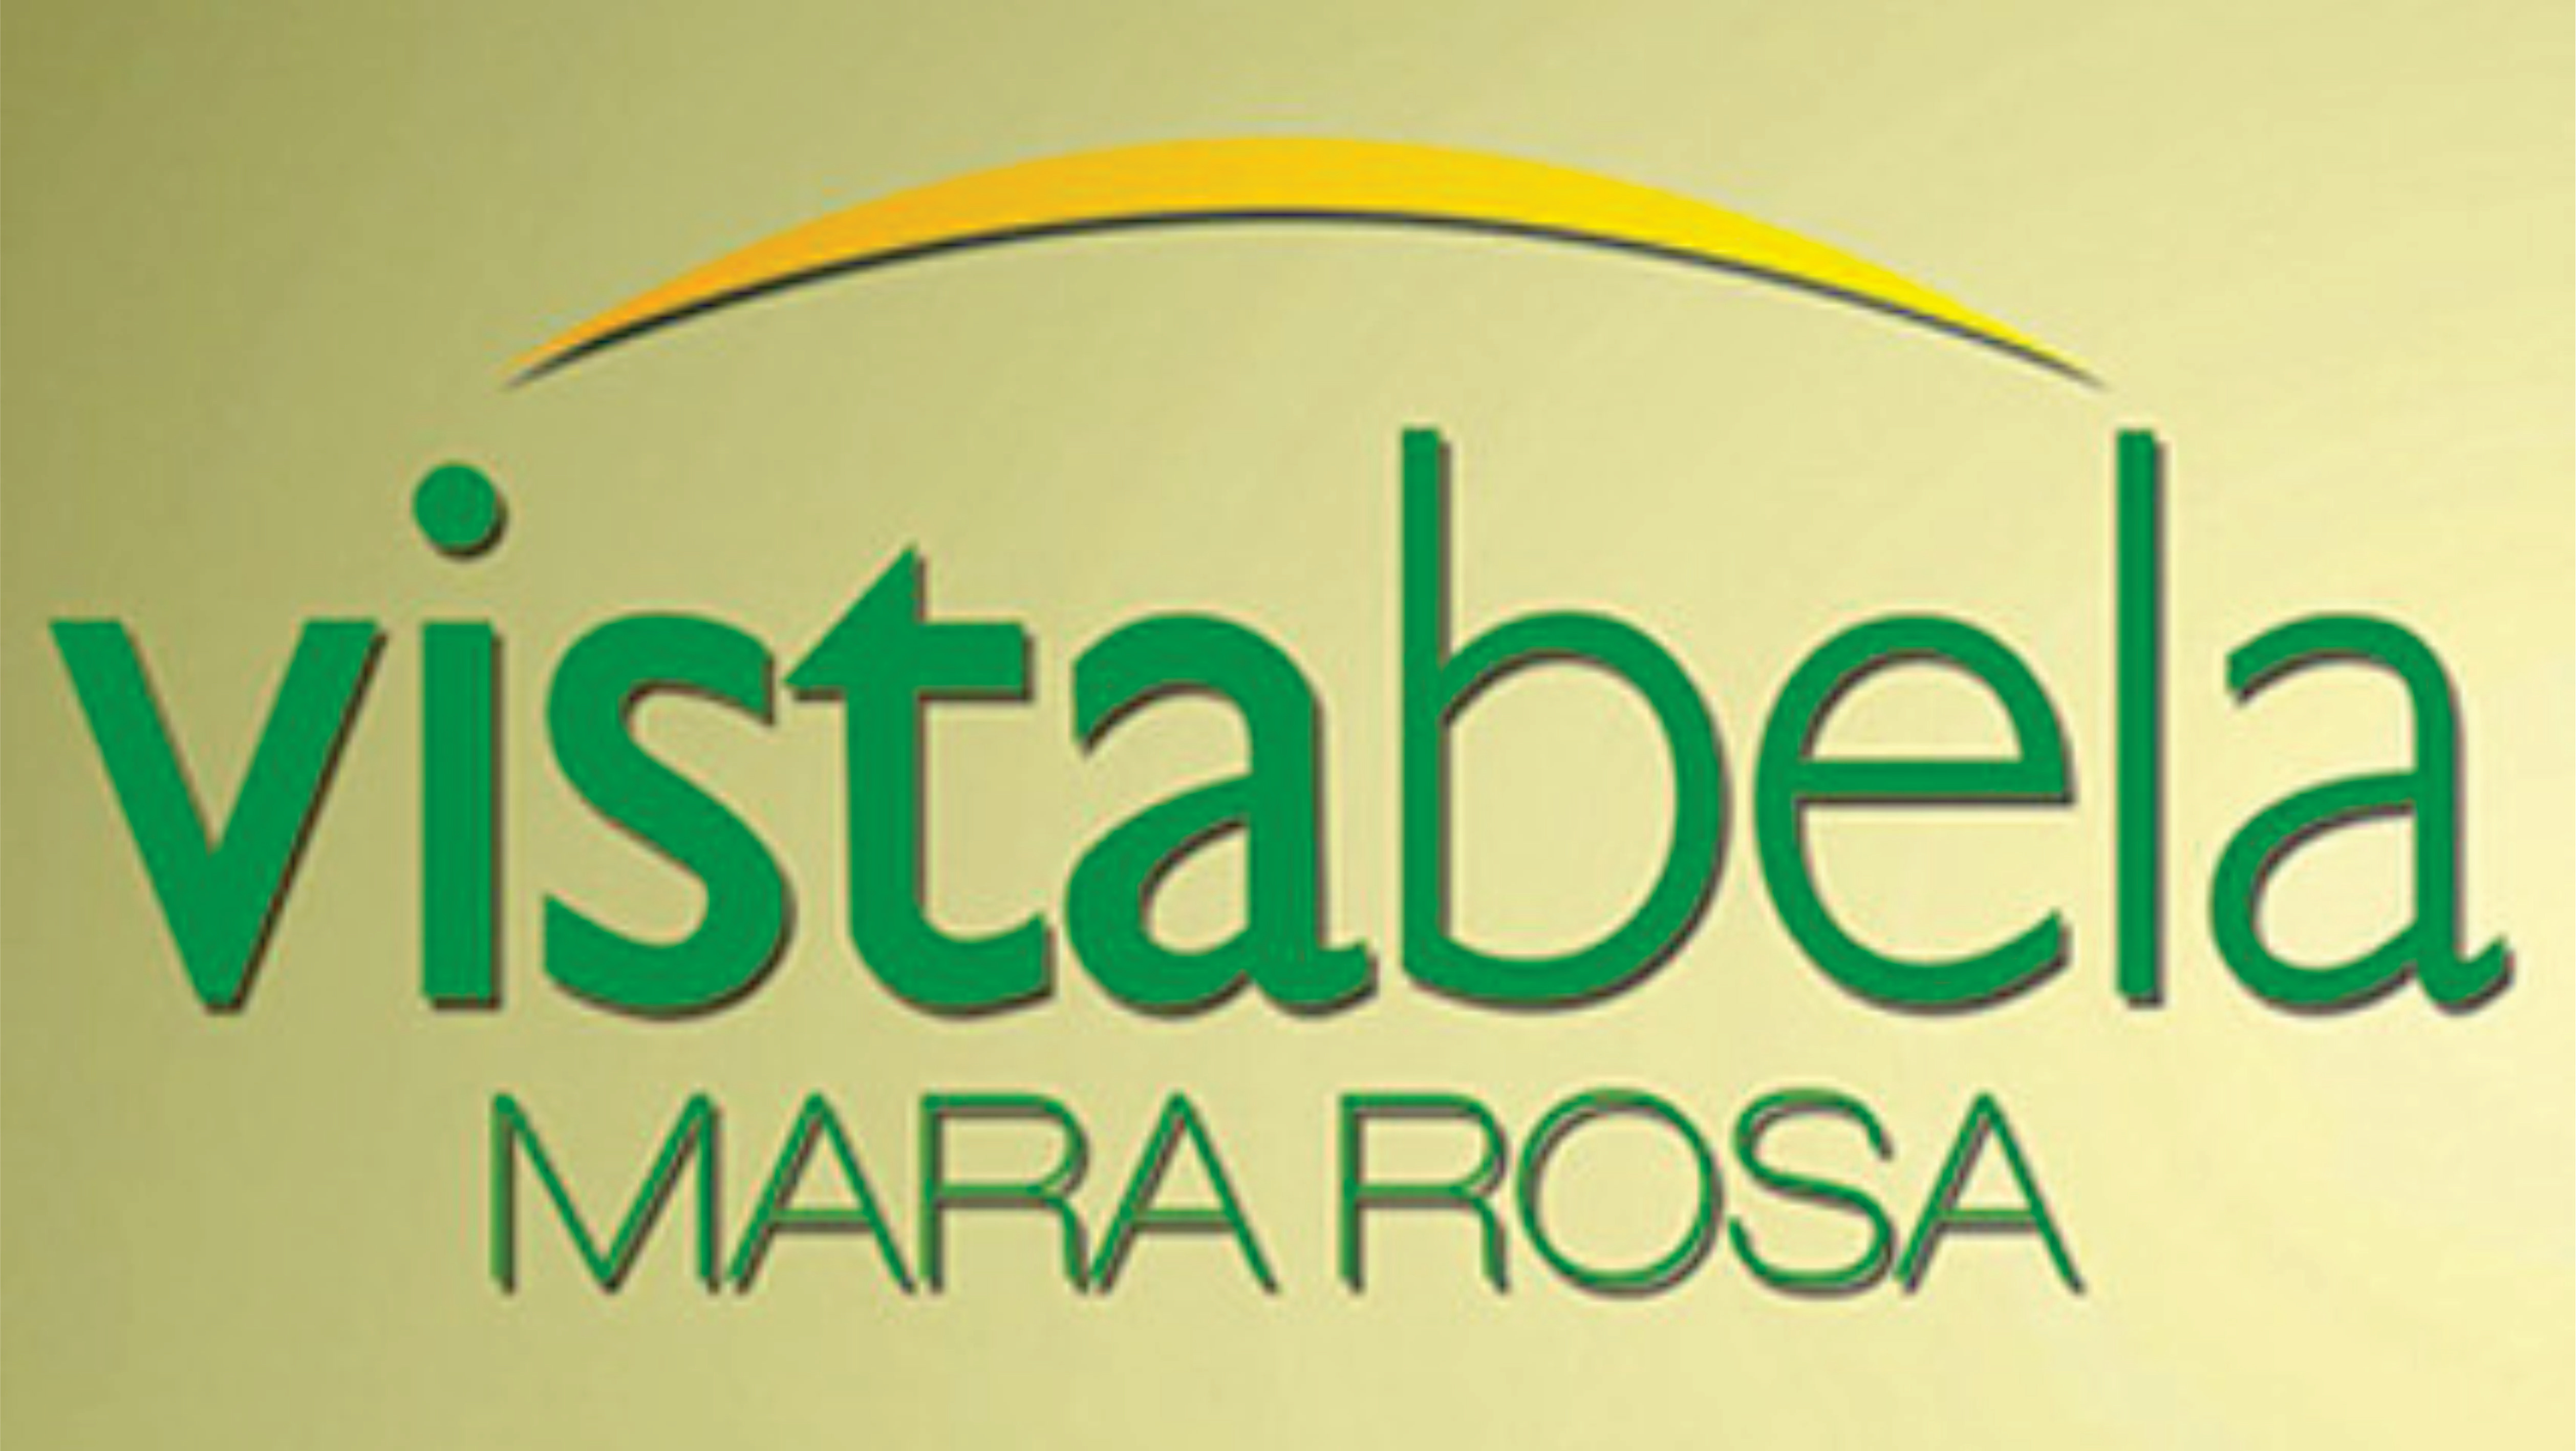 Residencial Vistabela - Mara Rosa